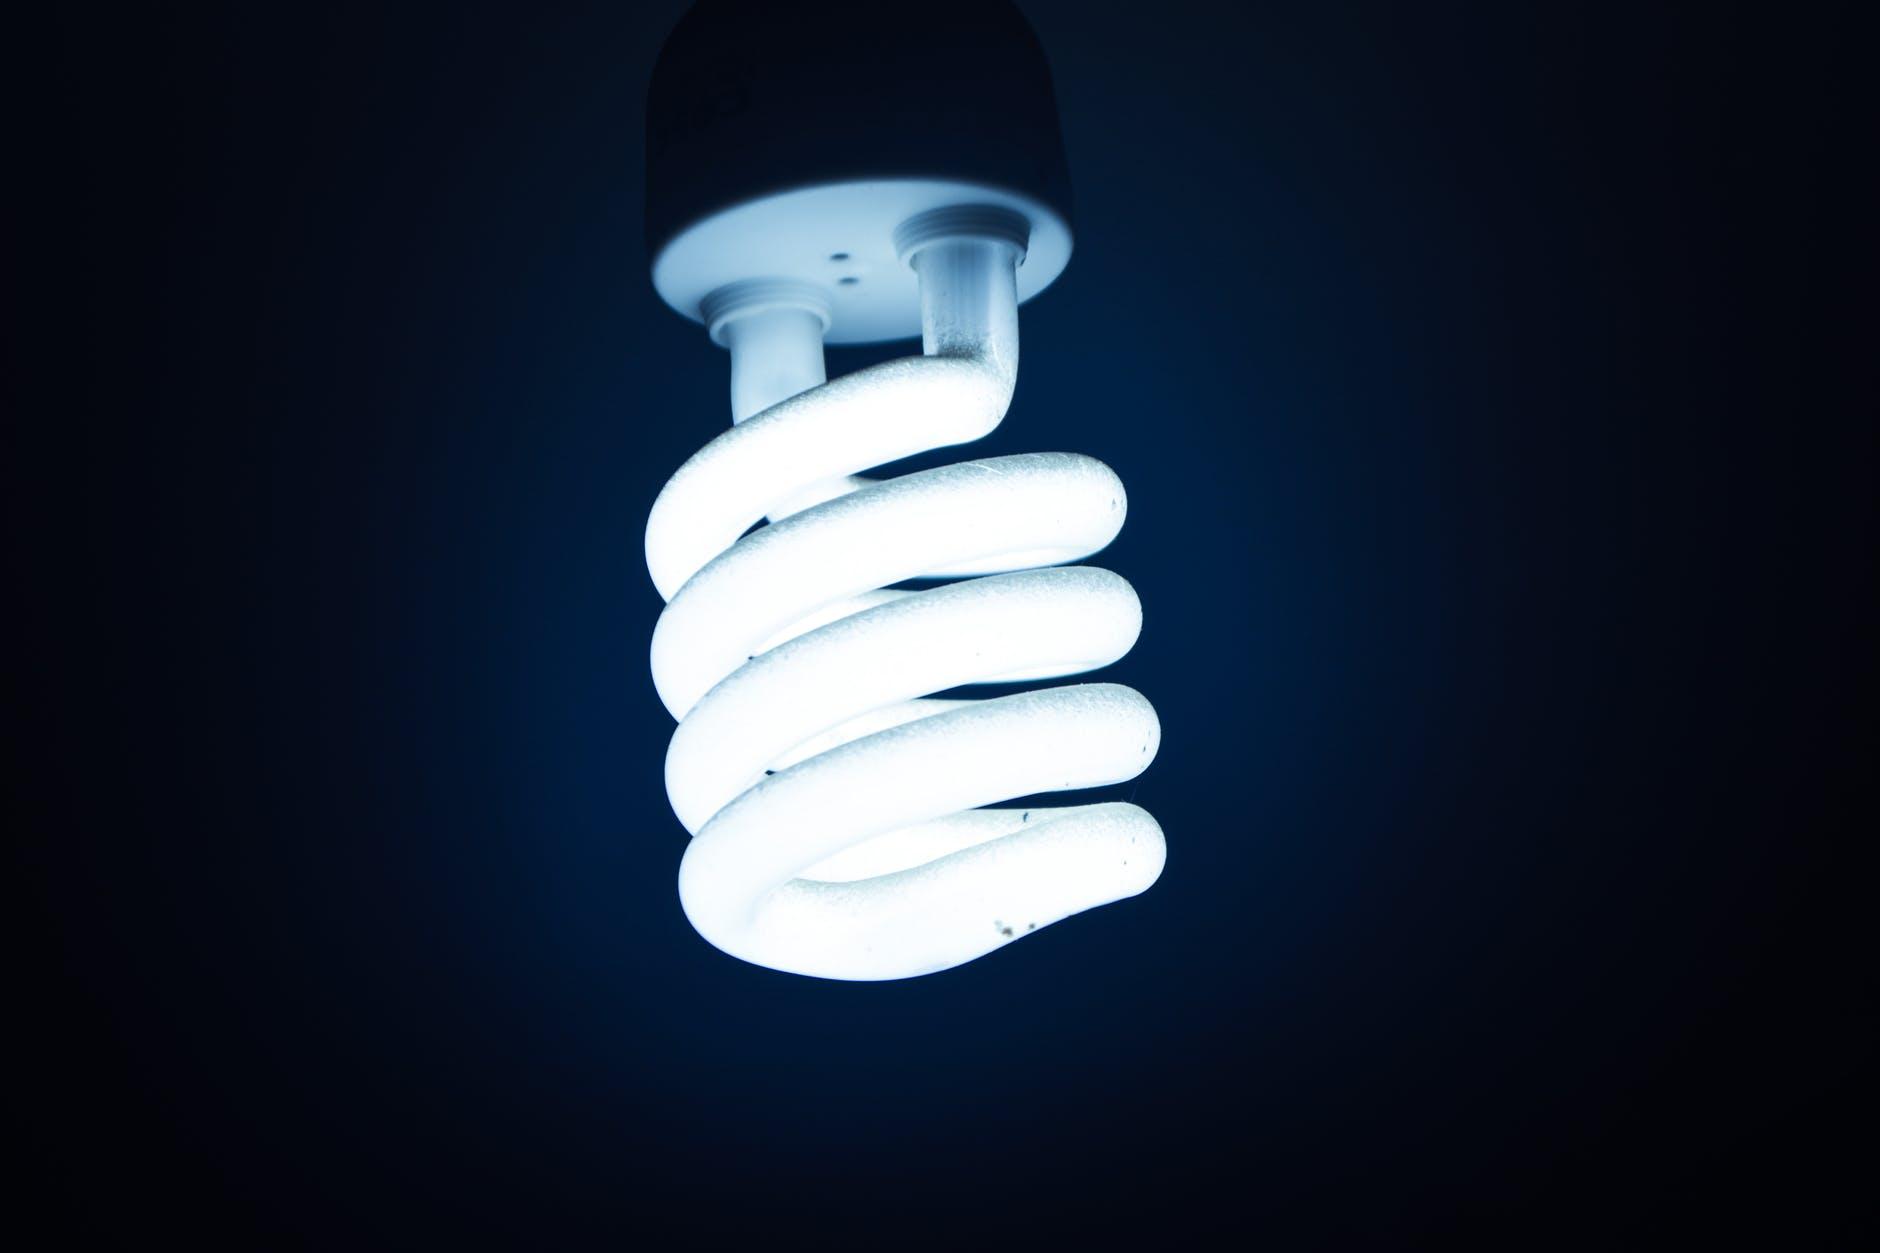 habitosparaecnomizarenergia - Hábitos para economizar energia